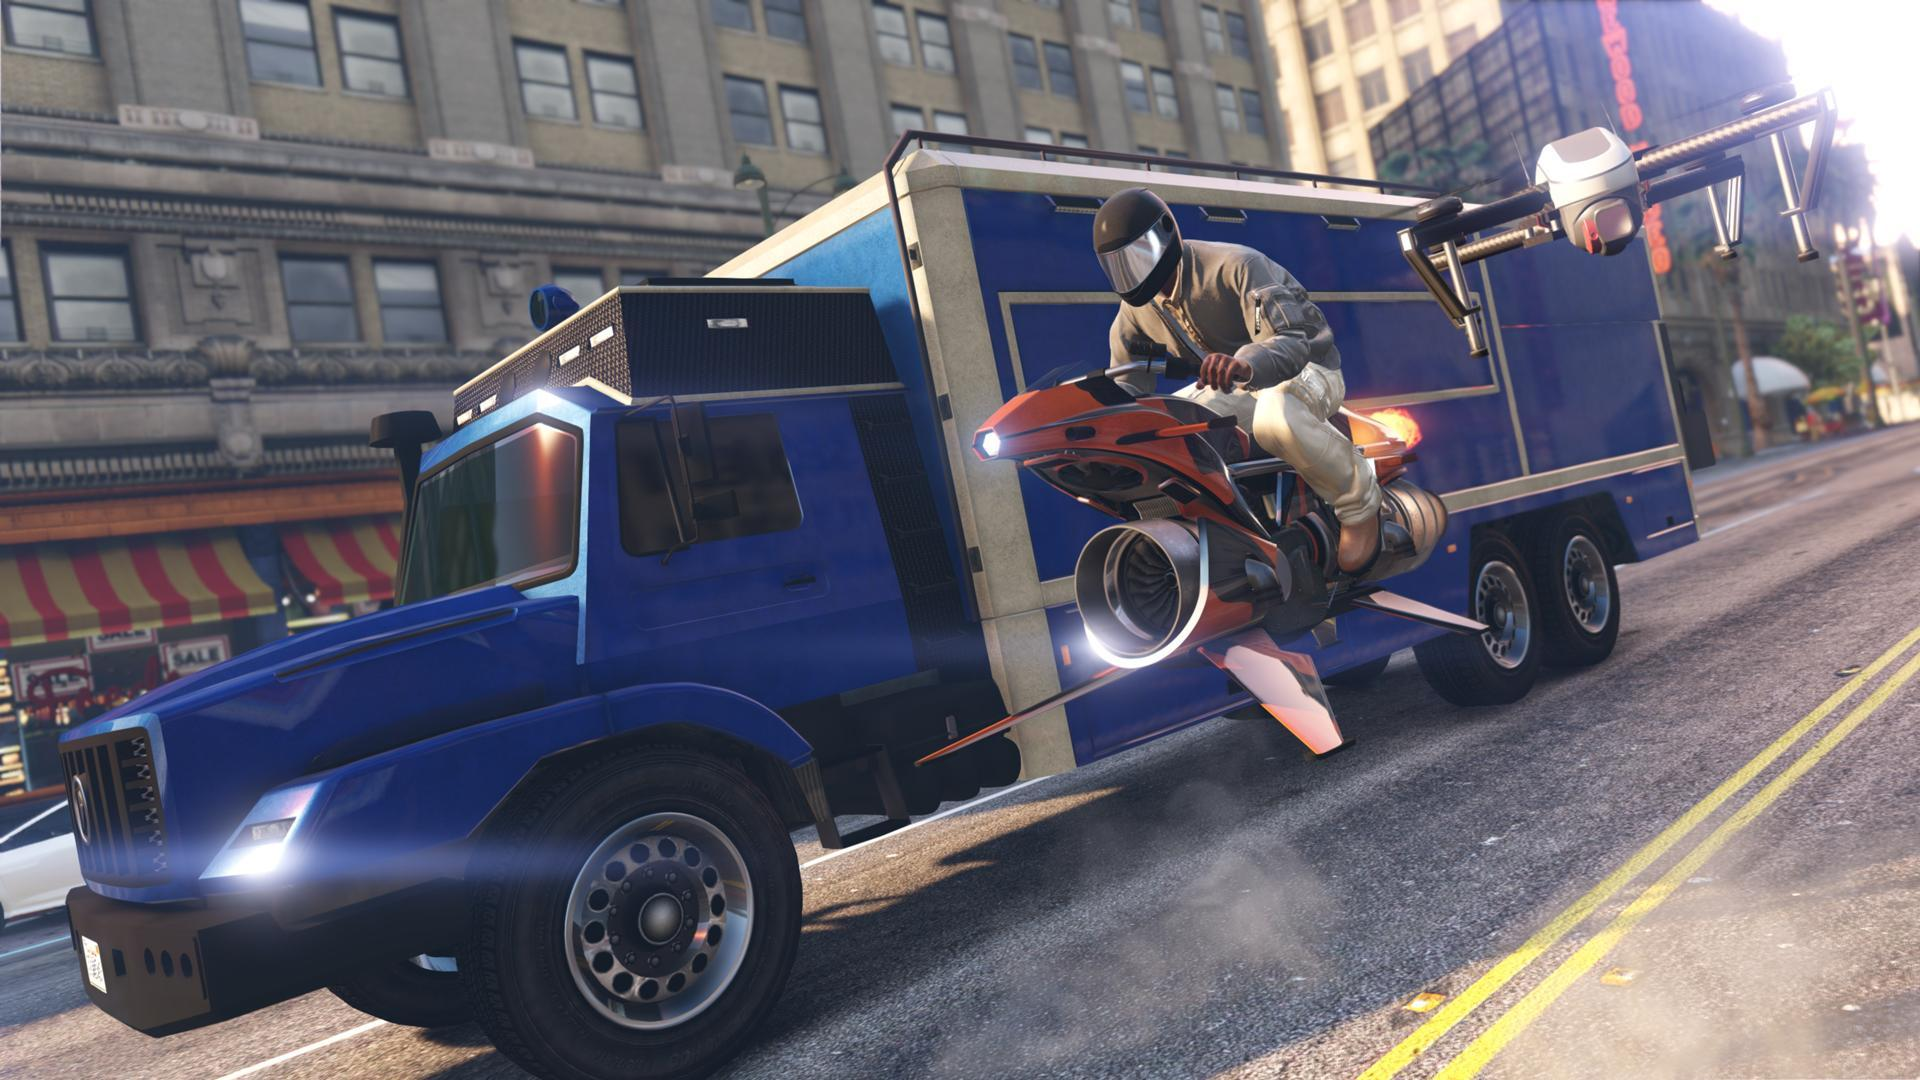 Oppressor MK II - GTA V Vehicles Database & Statistics - Grand Theft